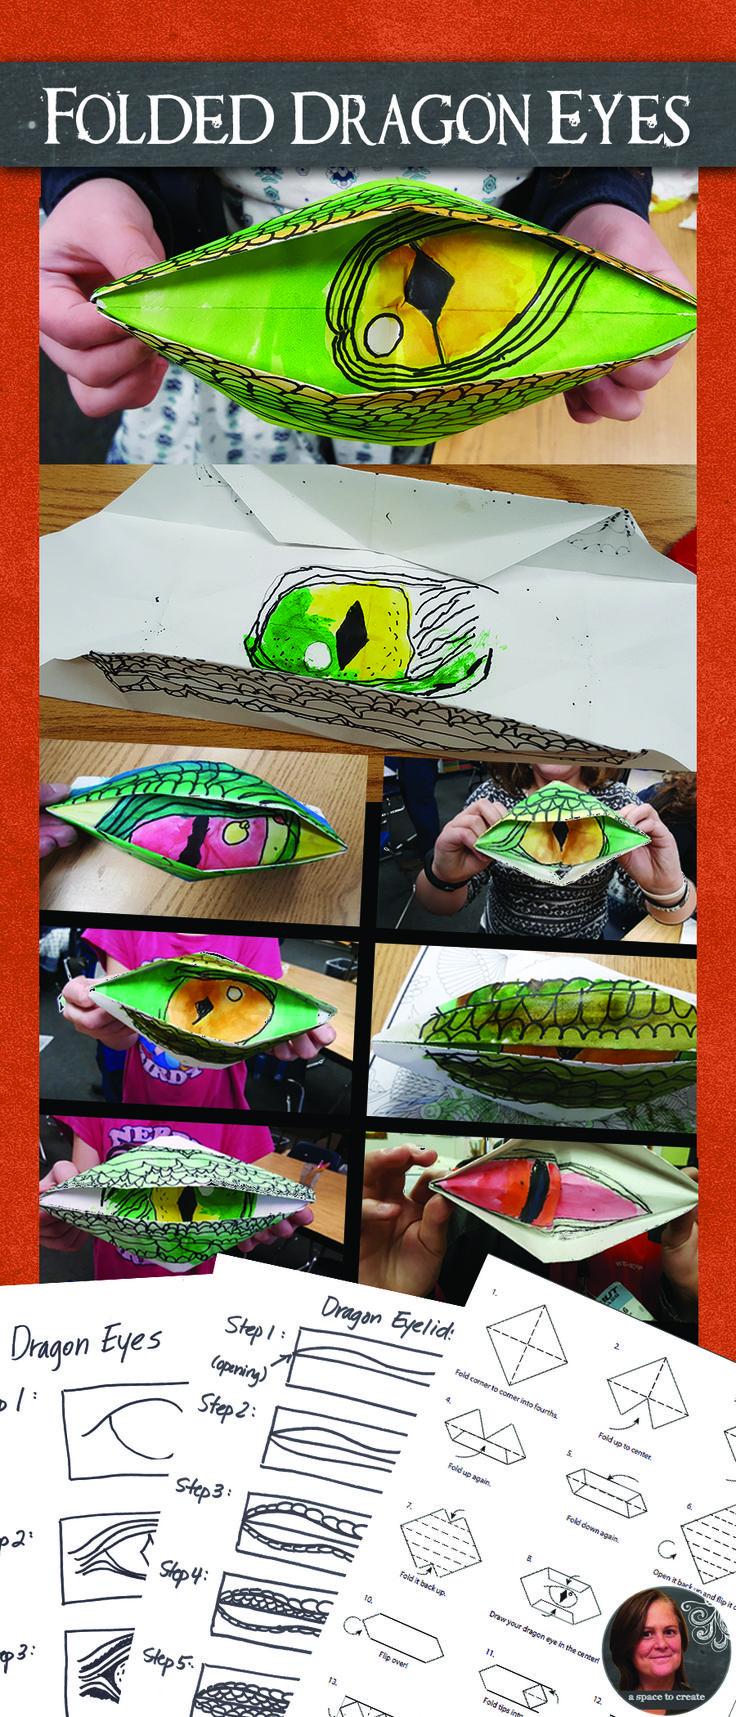 Folded Dragon Eye Art Lektion, sehr ansprechende Lektion für Kinder der oberen Grundstufe.